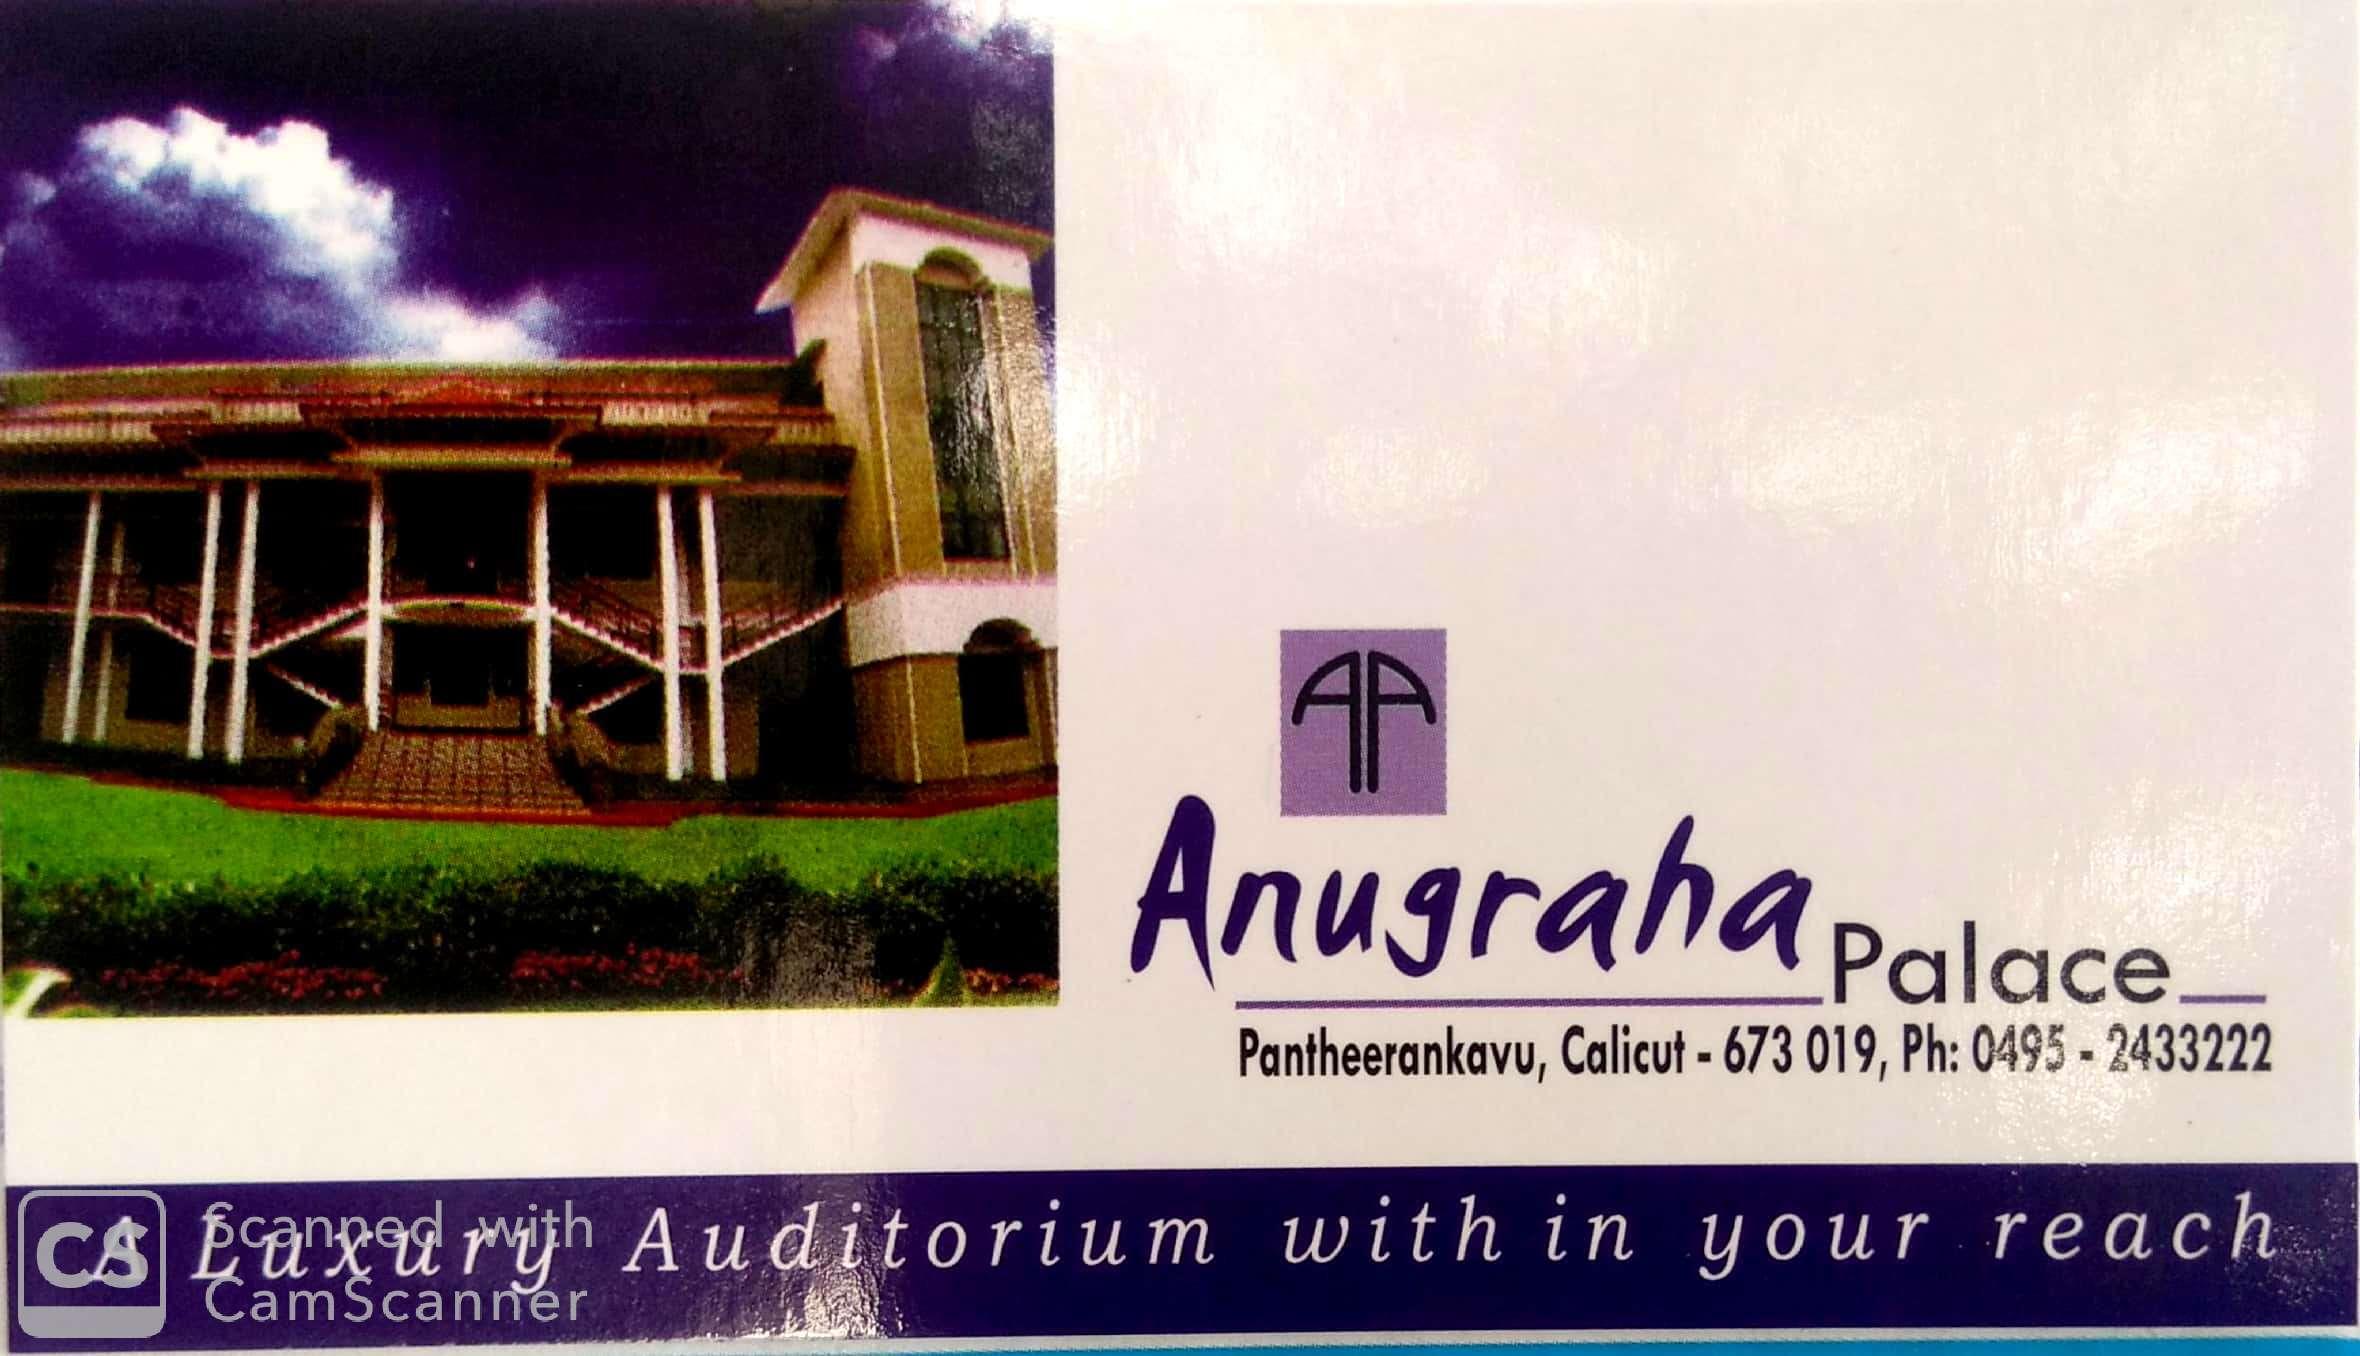 Anugraha palace, AUDITORIUM & HALLS,  service in Mankavu, Kozhikode